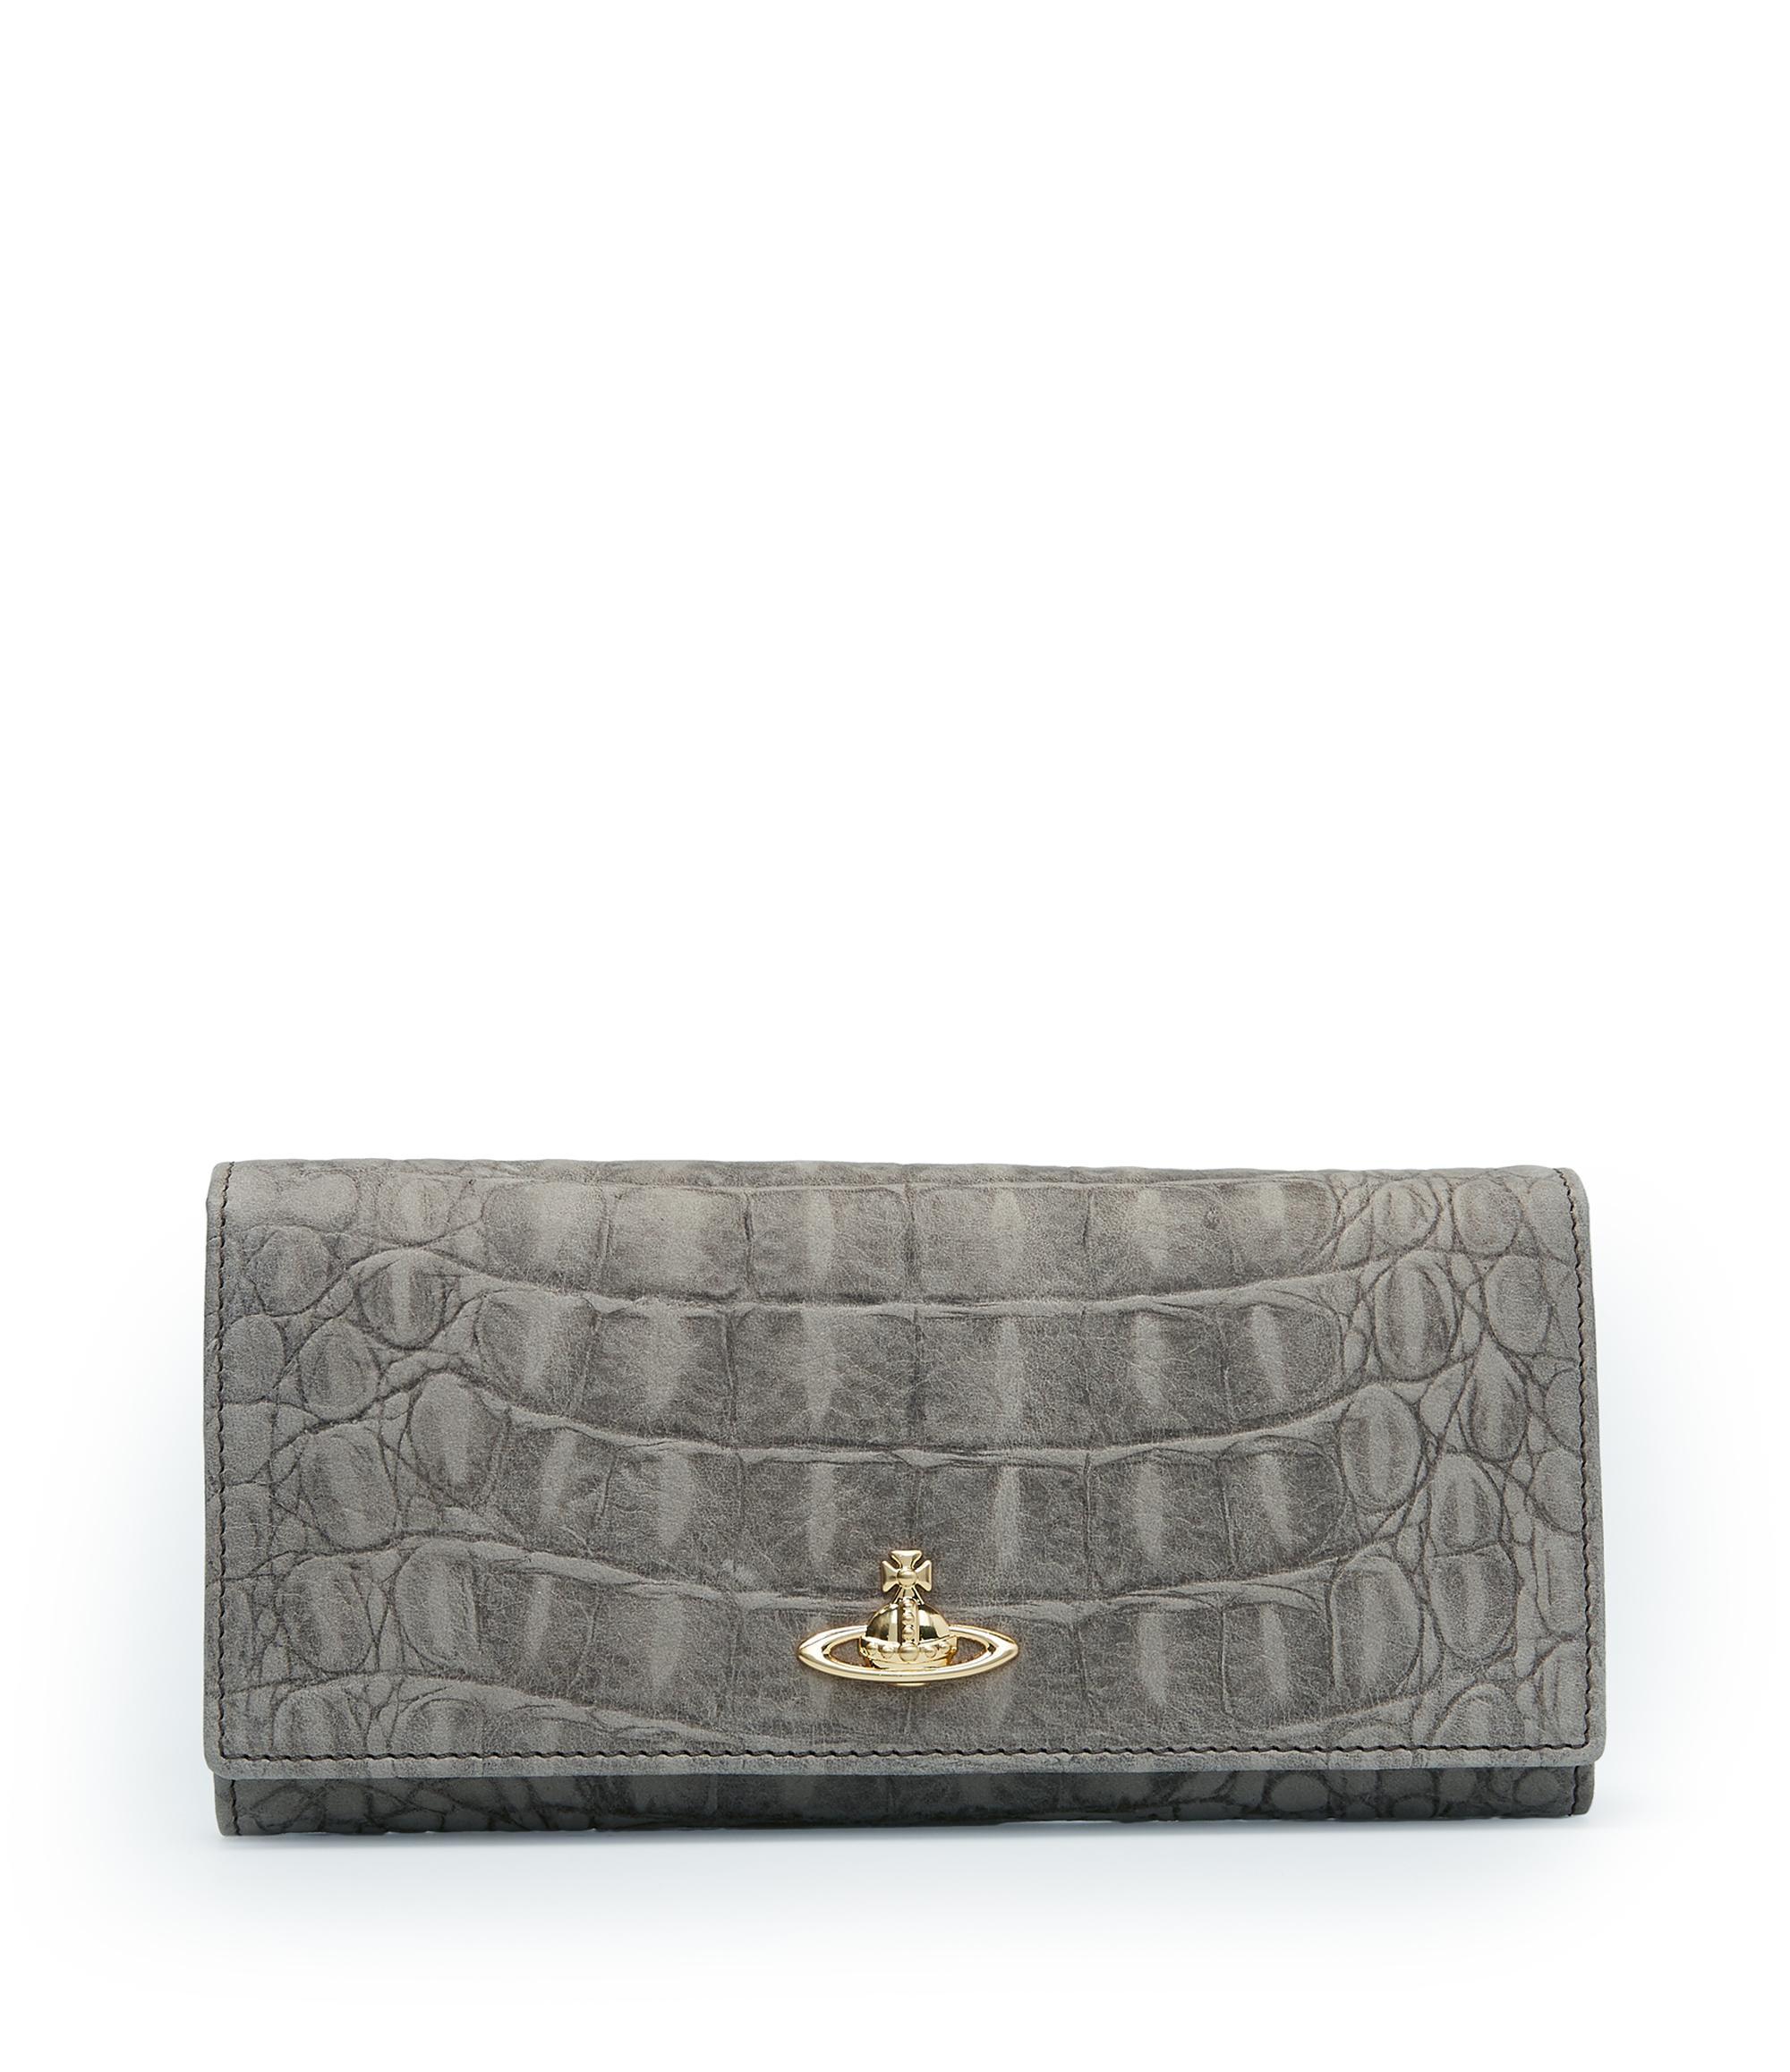 49edfe10333 Vivienne Westwood Grey Amazonia Wallet 321321 | ModeSens